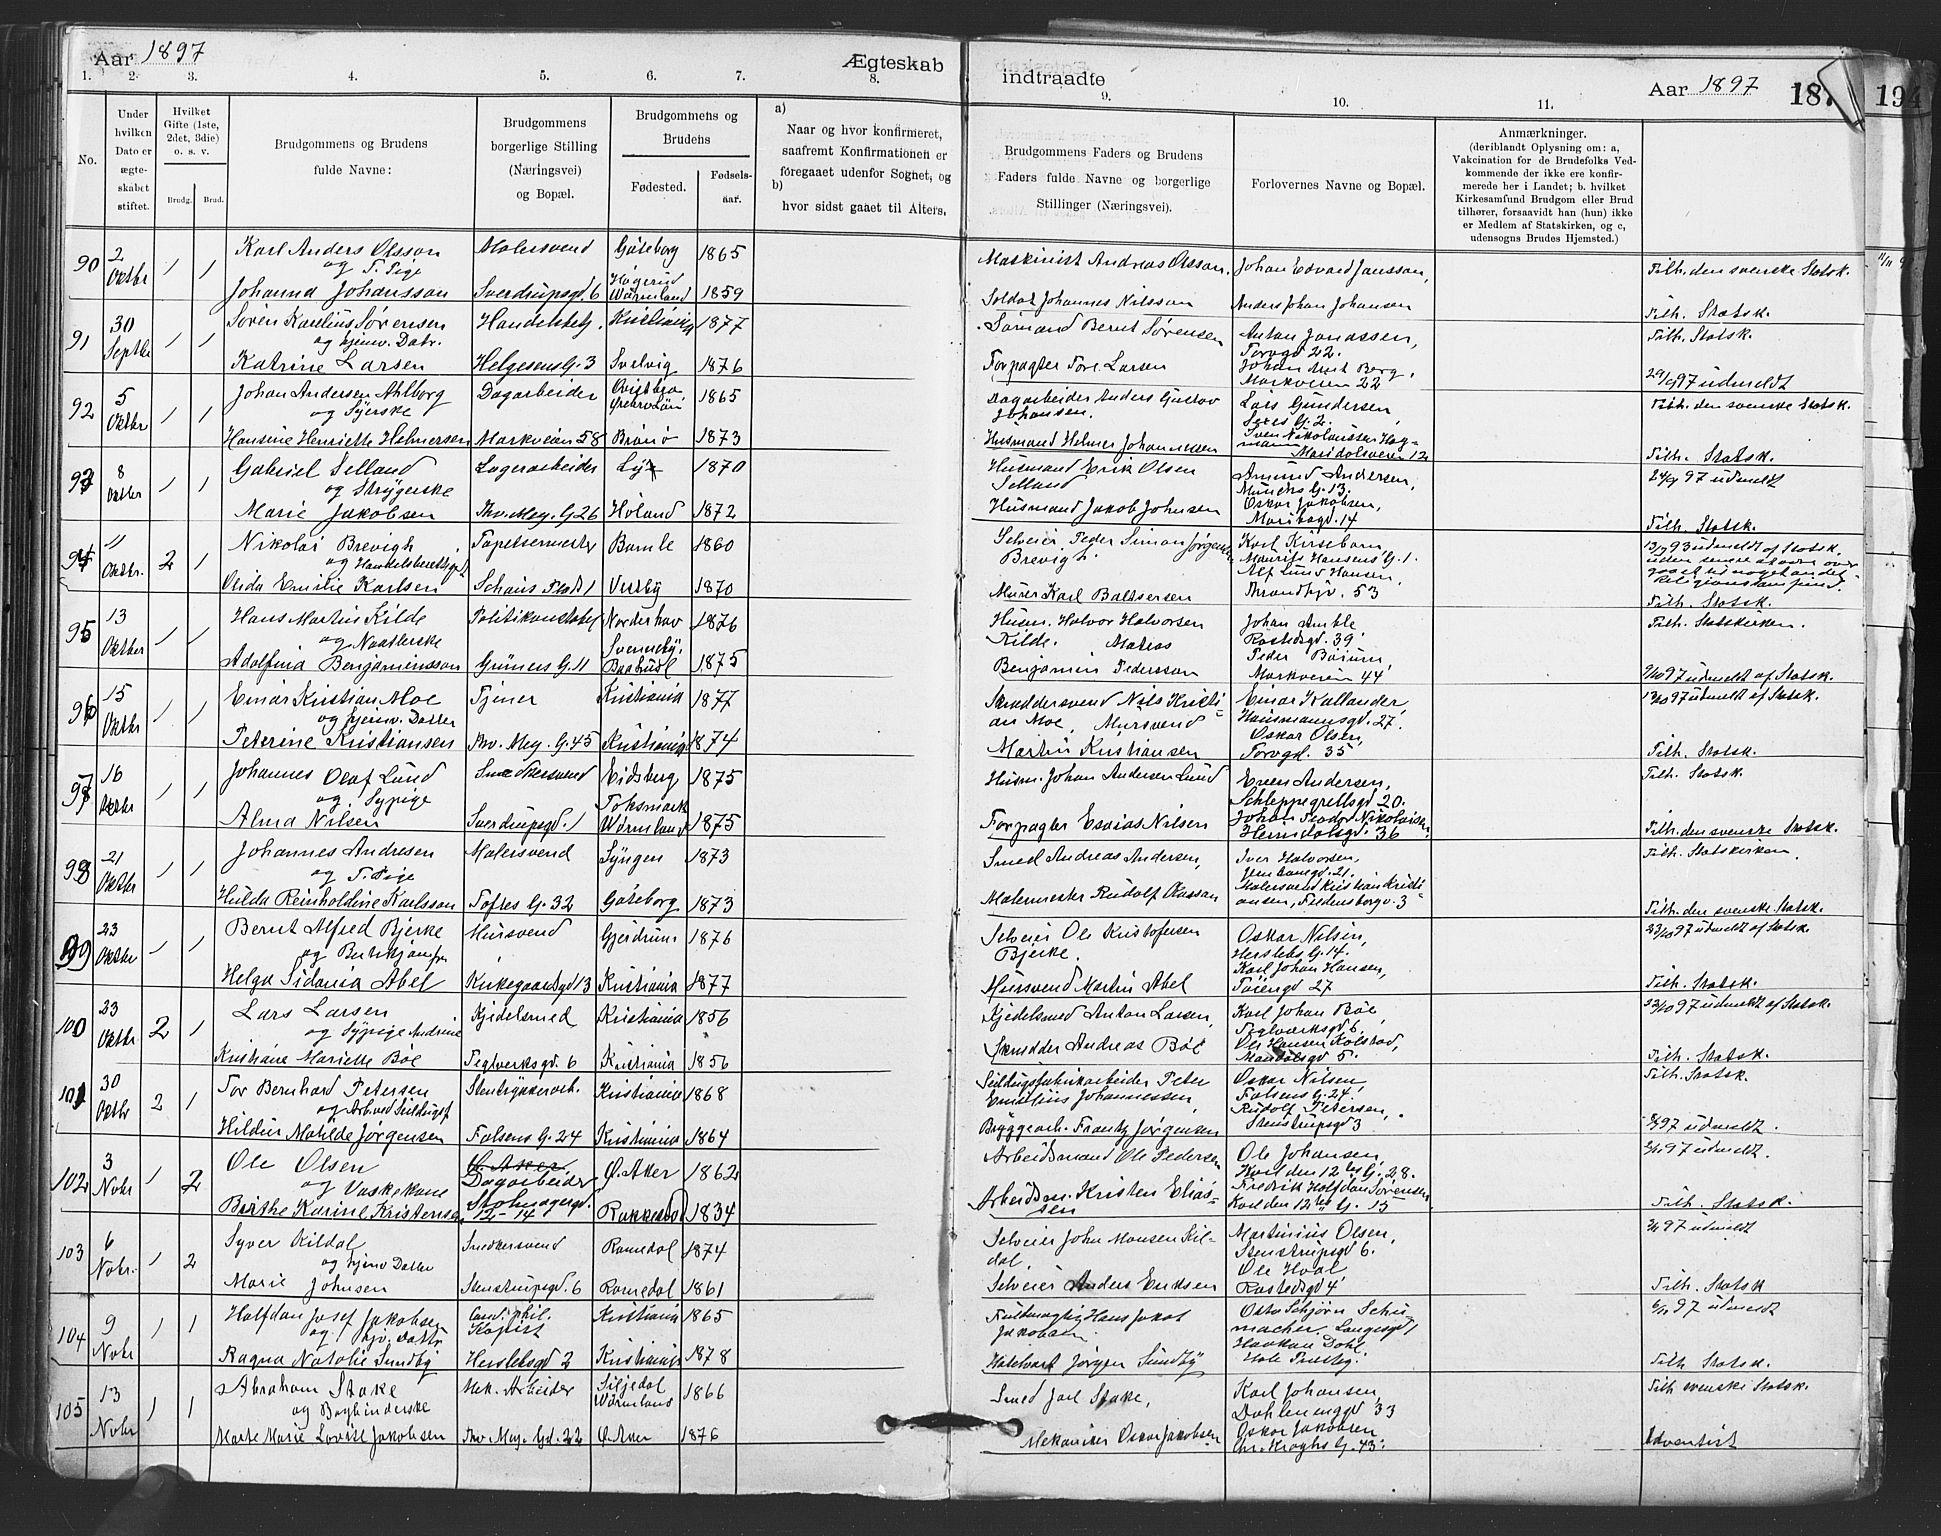 SAO, Paulus prestekontor Kirkebøker, F/Fa/L0012: Ministerialbok nr. 12, 1897-1908, s. 187